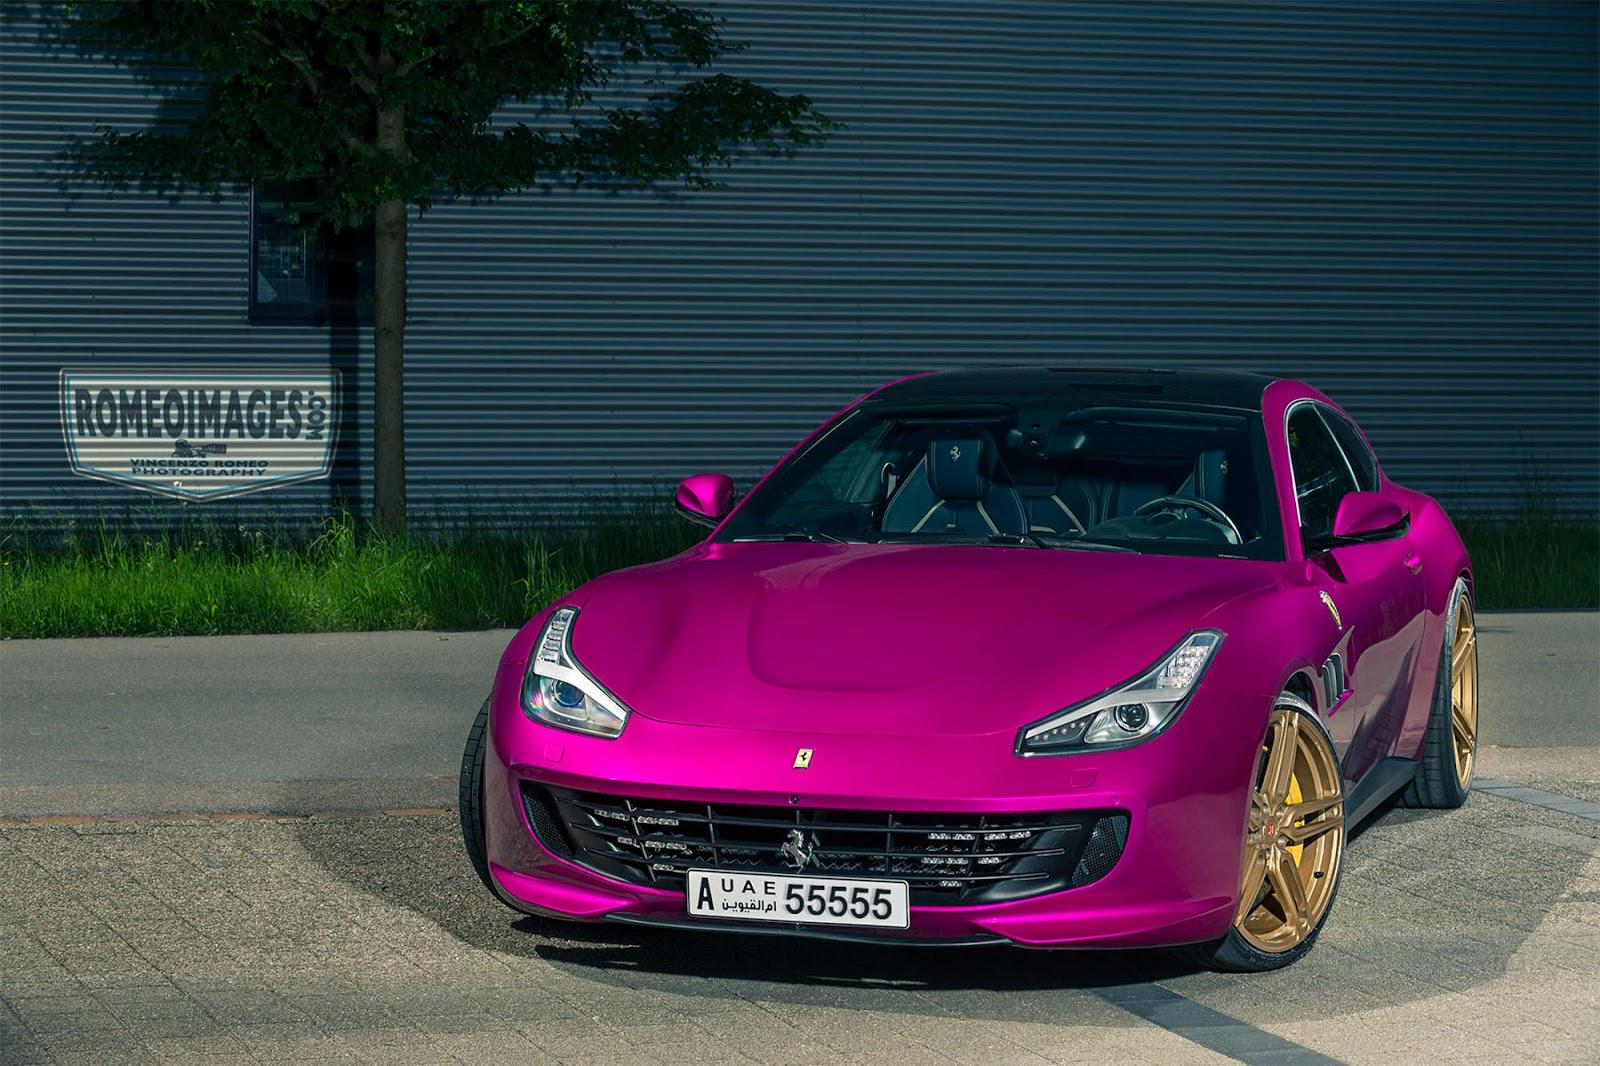 Pink Ferrari GTC4Lusso Goes Against Ferrari Brand Rule